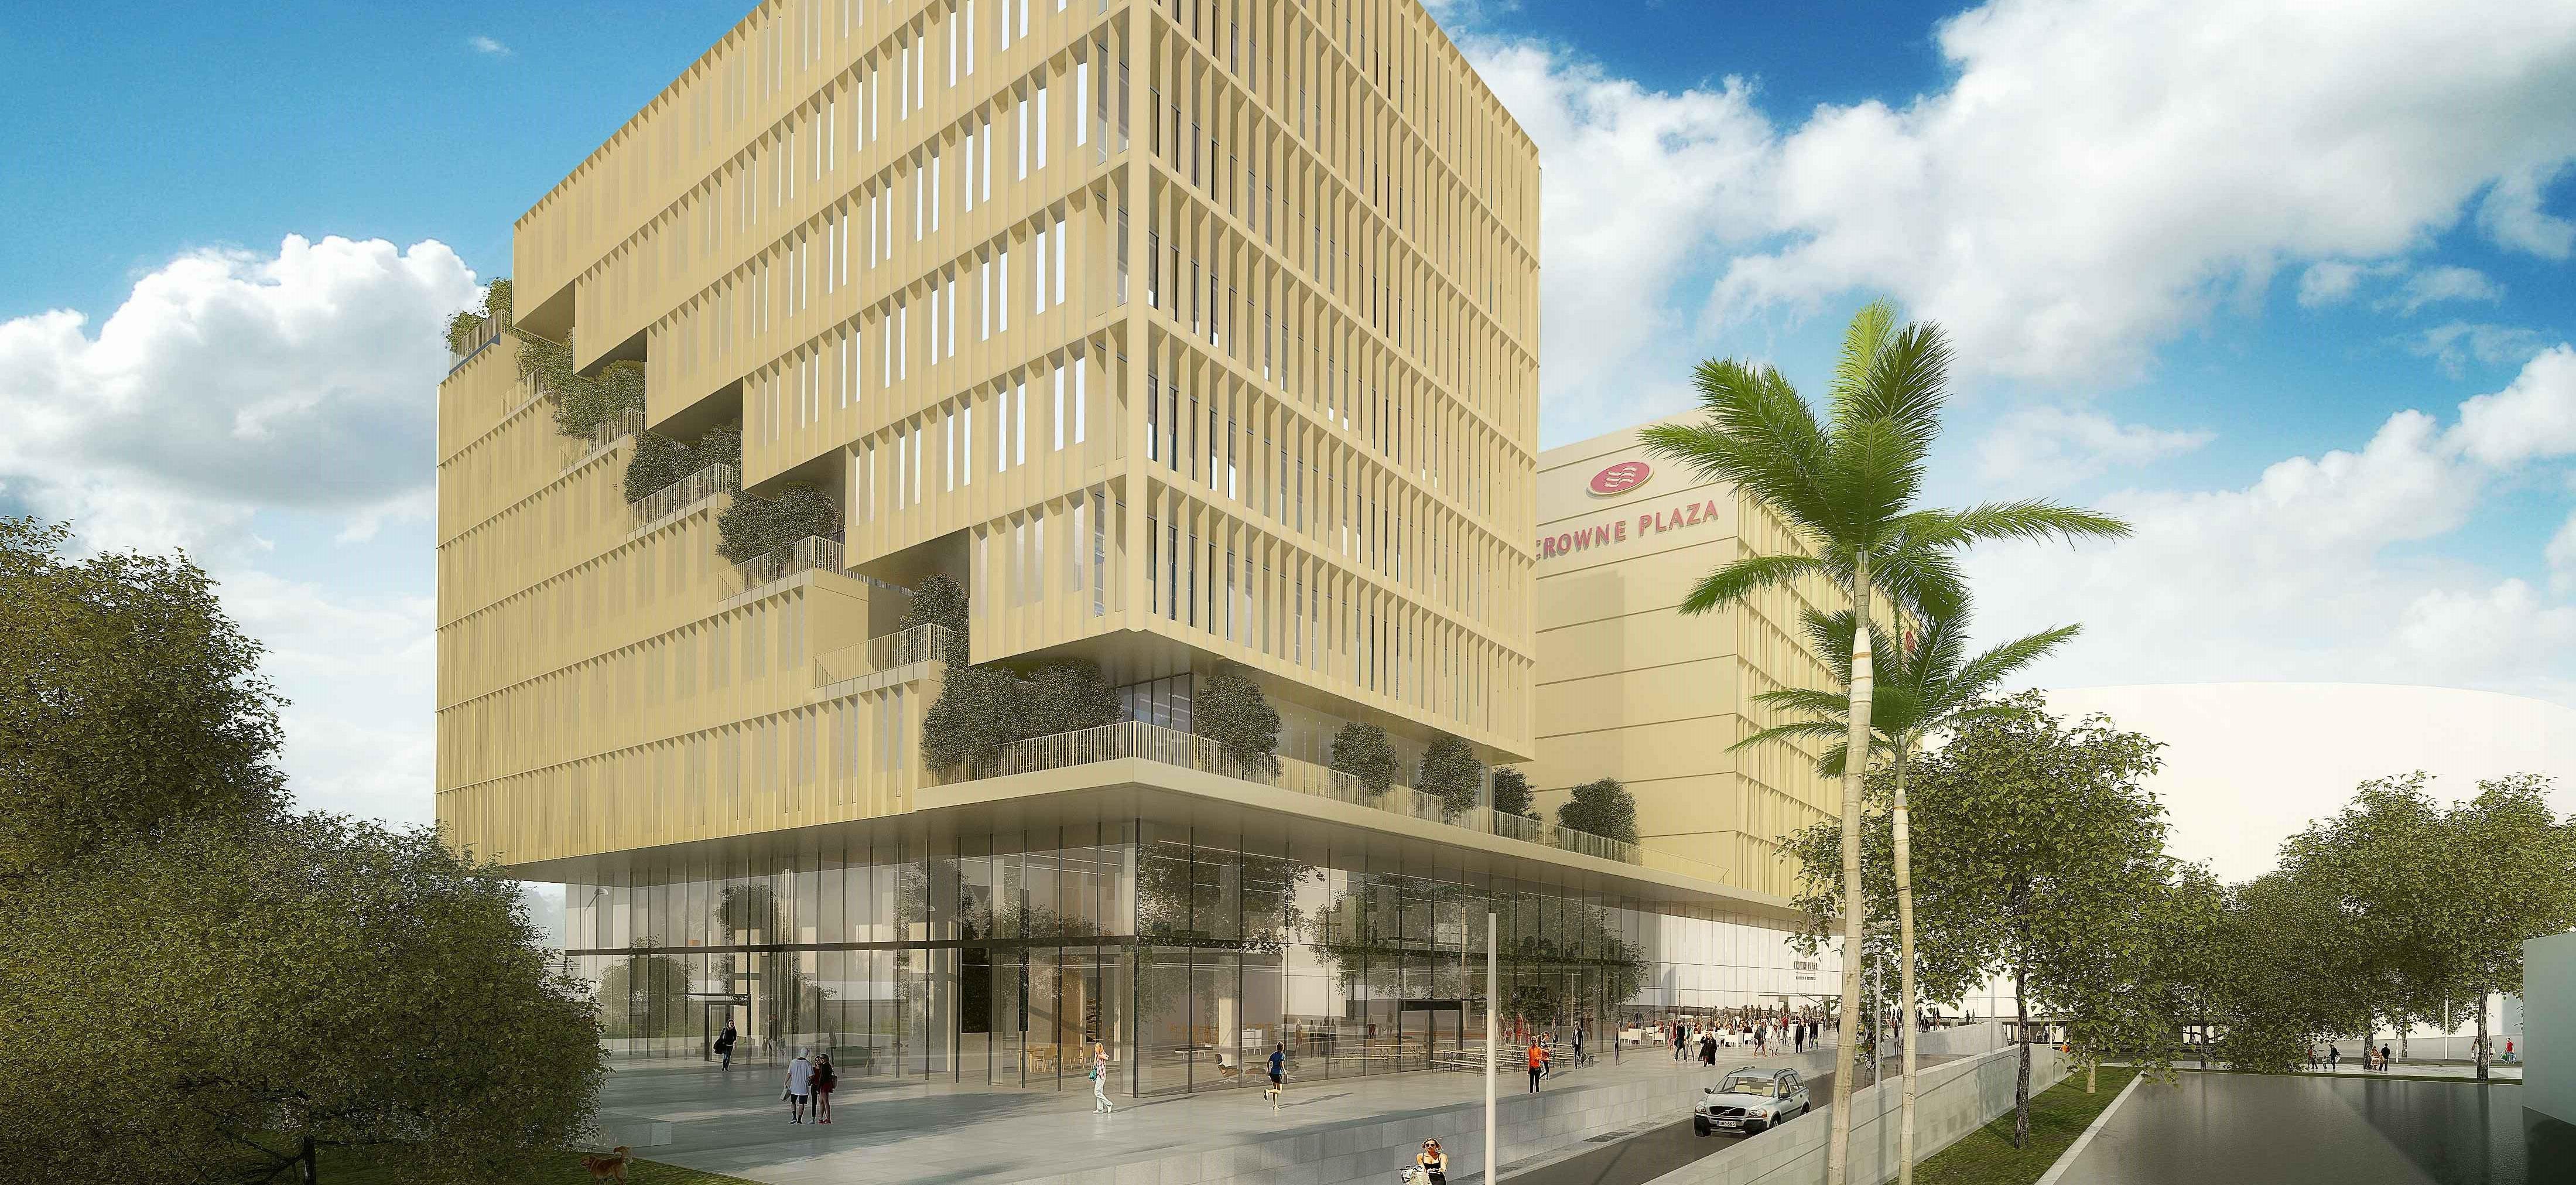 HPVA-Hotels-Projet-Nice-Grand-Arénas-coté-rue-coste-et-bellonte-galerie